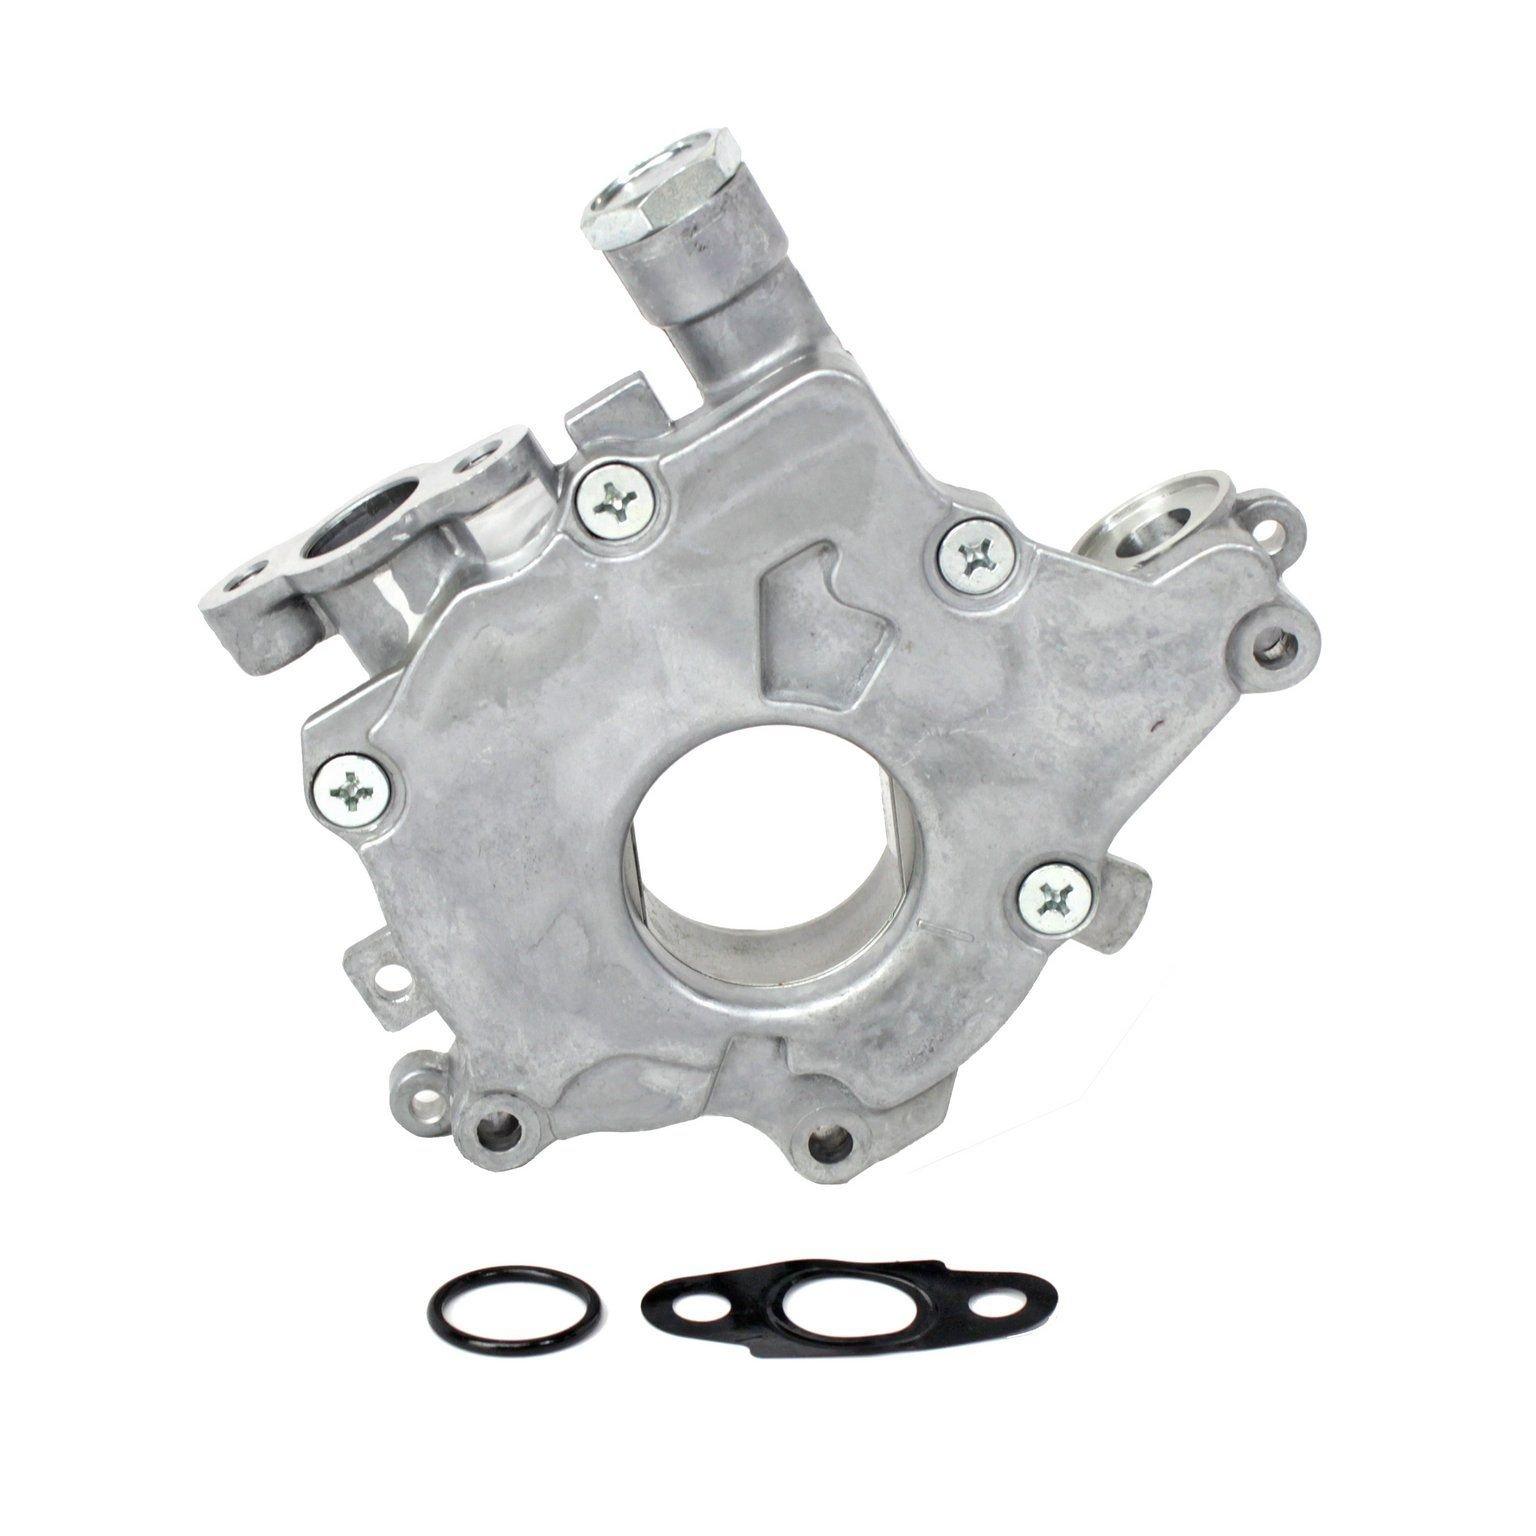 Nissan pathfinder engine oil pump replacement dj rock for Nissan pathfinder motor oil